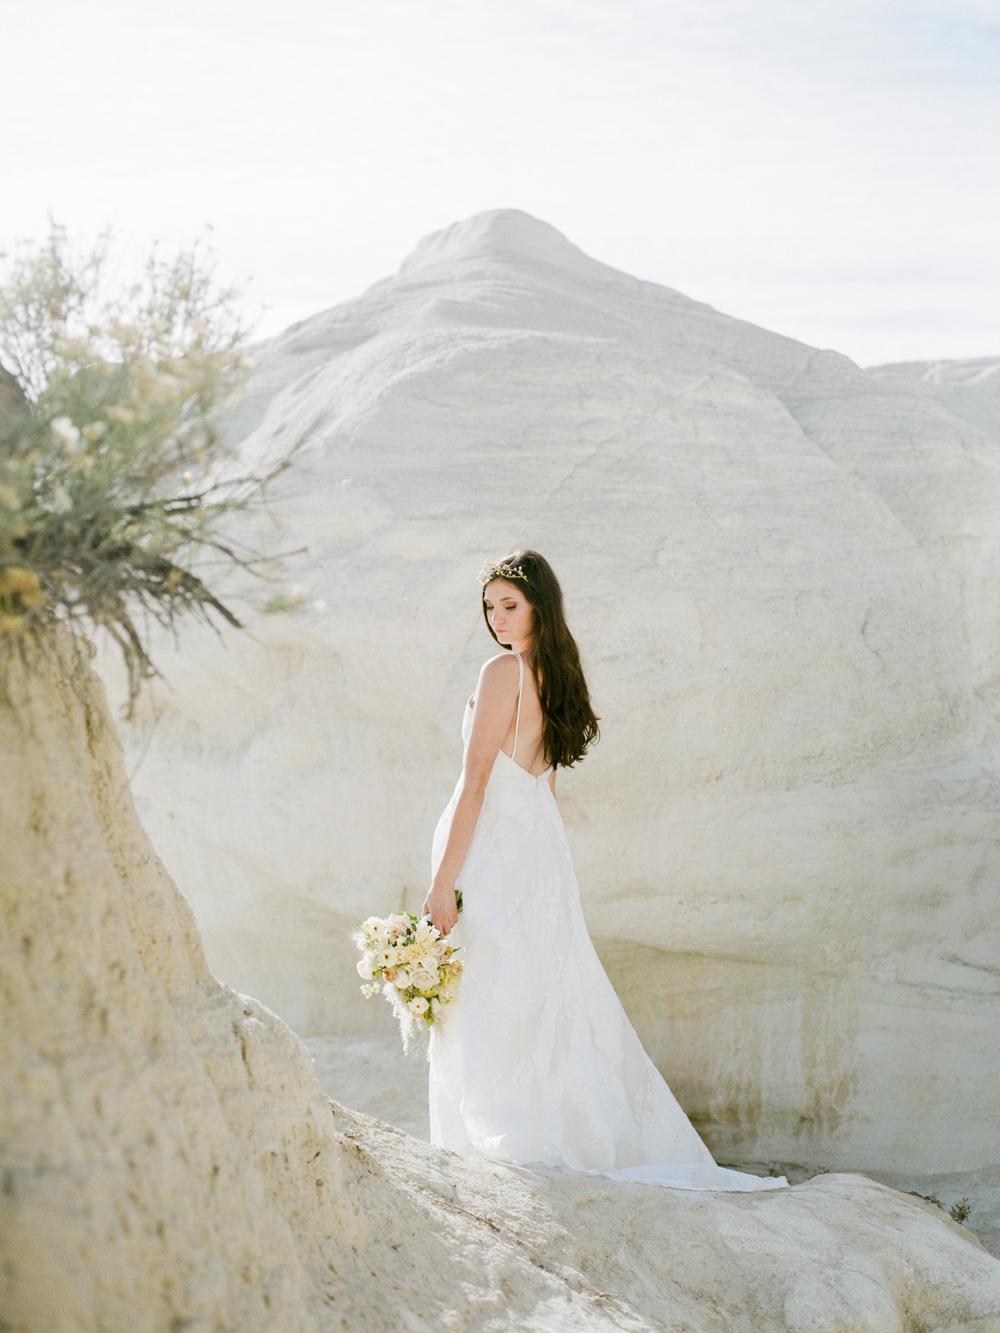 Christine Gosch - destination film photographer - houston wedding photographer - fine art film photographer - elopement photographer - destination wedding - understated wedding - simple beautiful wedding photography-39.jpg